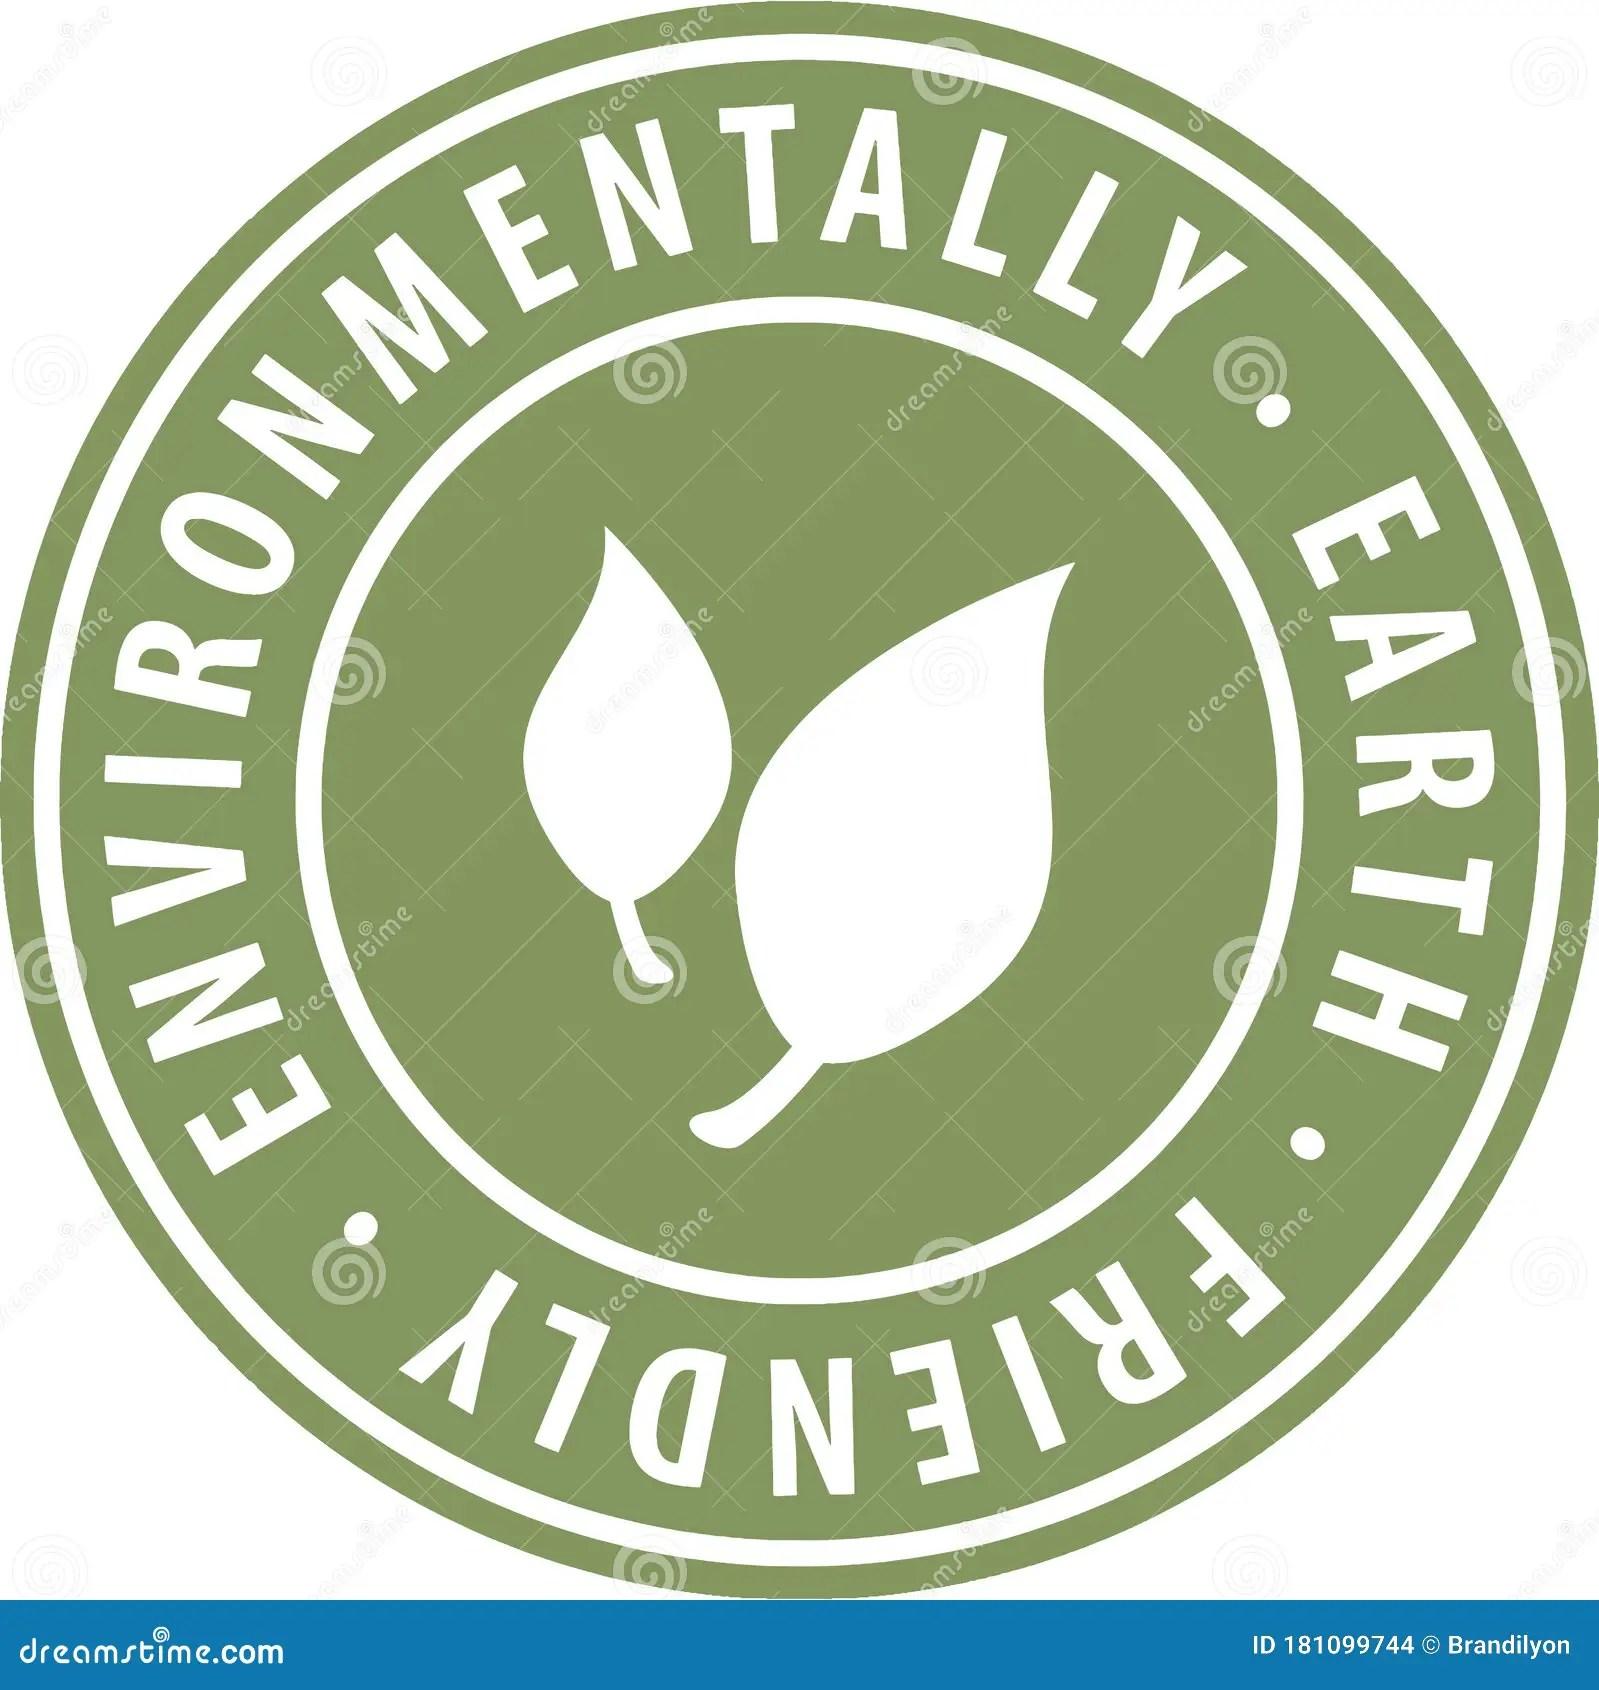 Environmental Earth Friendly Round Green Icon Symbol Badge